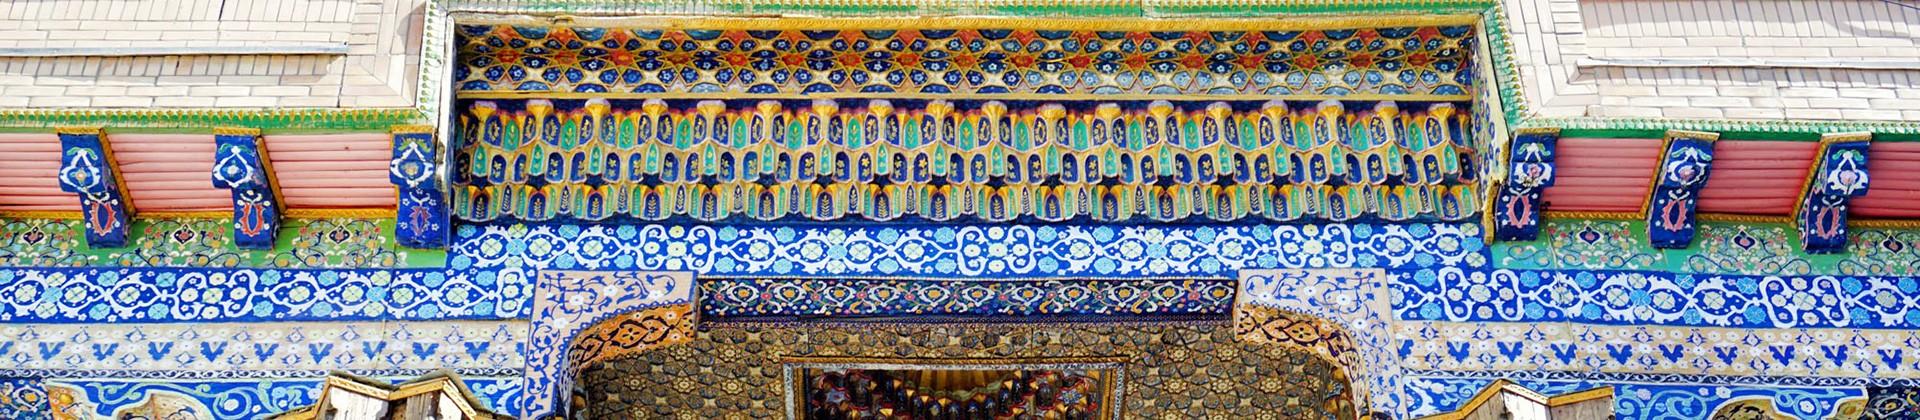 Sitorai Mohi Hosa - Emir's Summer Palace - 1